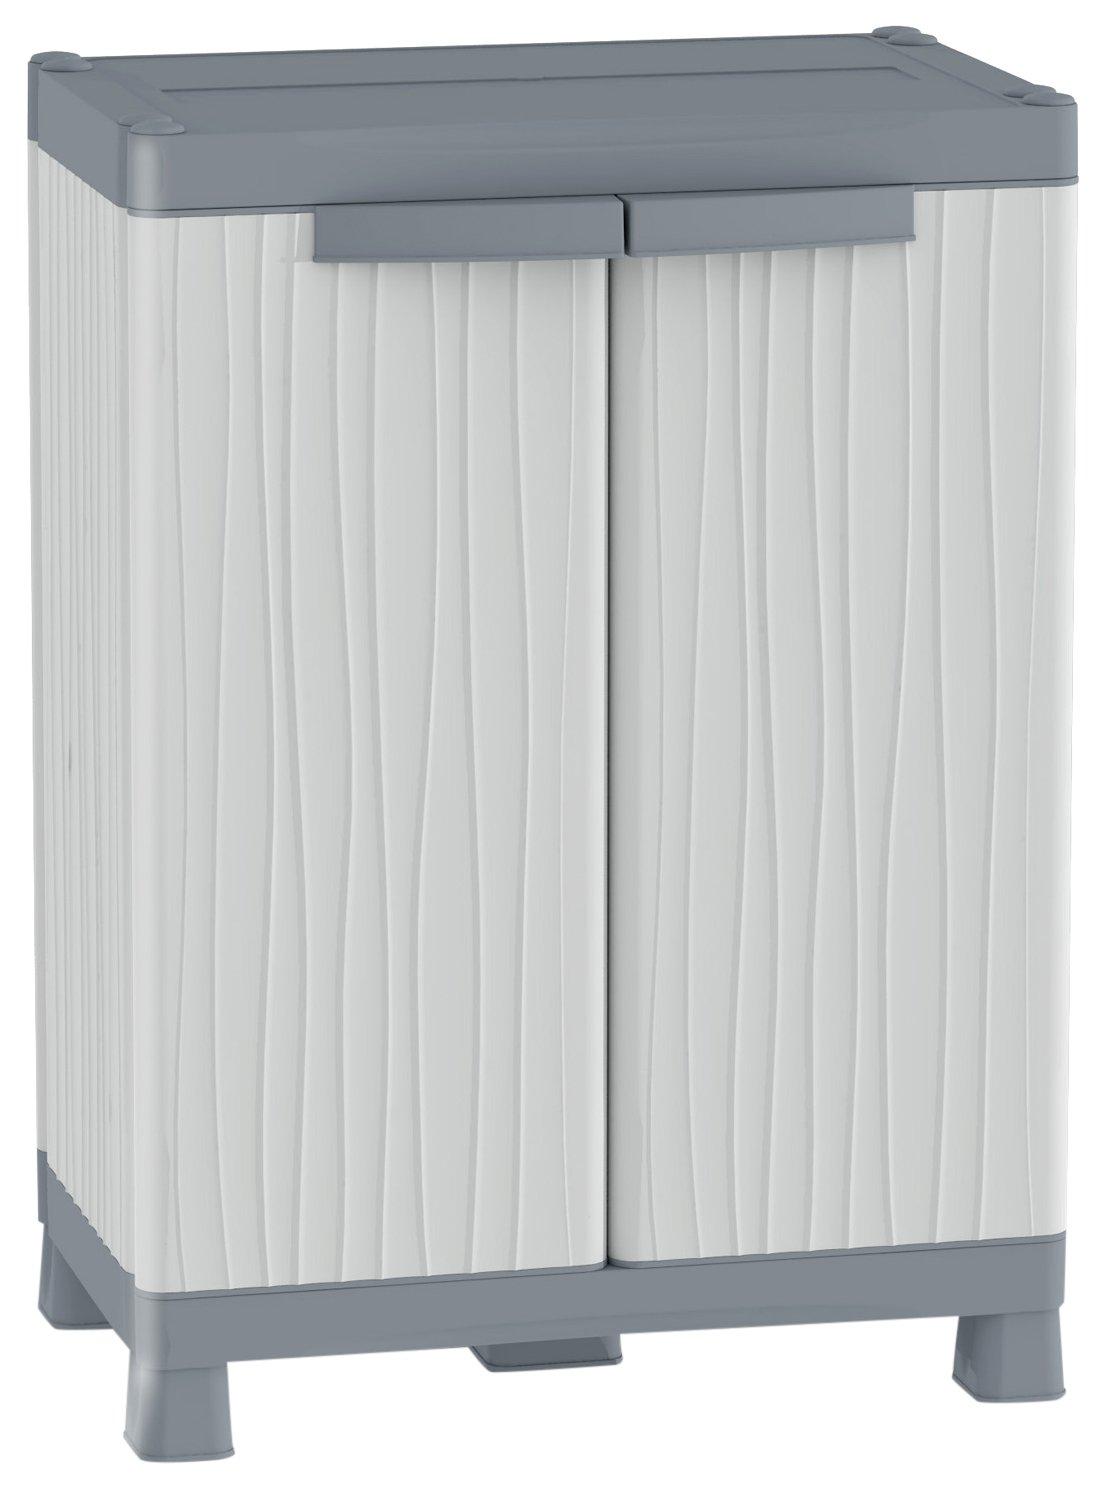 Terry - Armario plástico exterior, 1002569